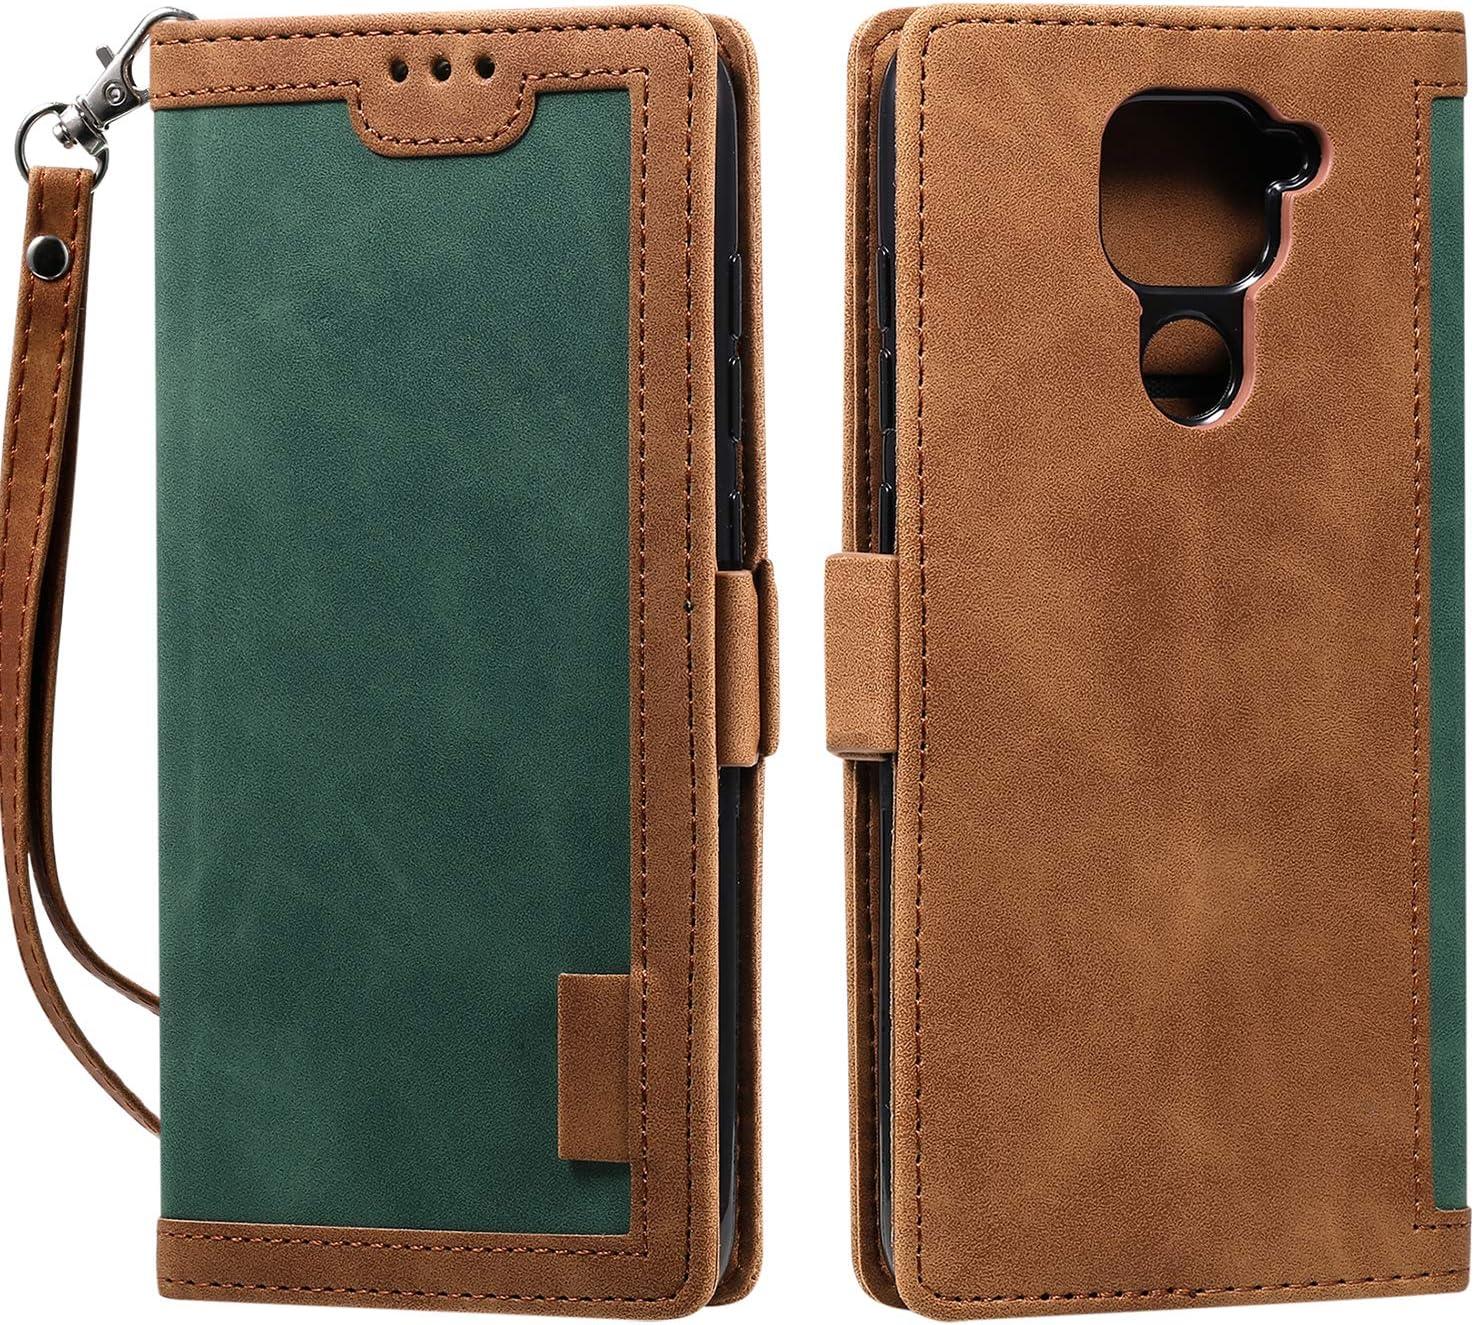 Abuenora Funda para Xiaomi Redmi Note 9, Carcasa Libro con Tapa Flip Case Antigolpes Cartera PU Cuero con Soporte Plegable Oficial Vintage Clasica Empalme Funda Color Verde Intenso